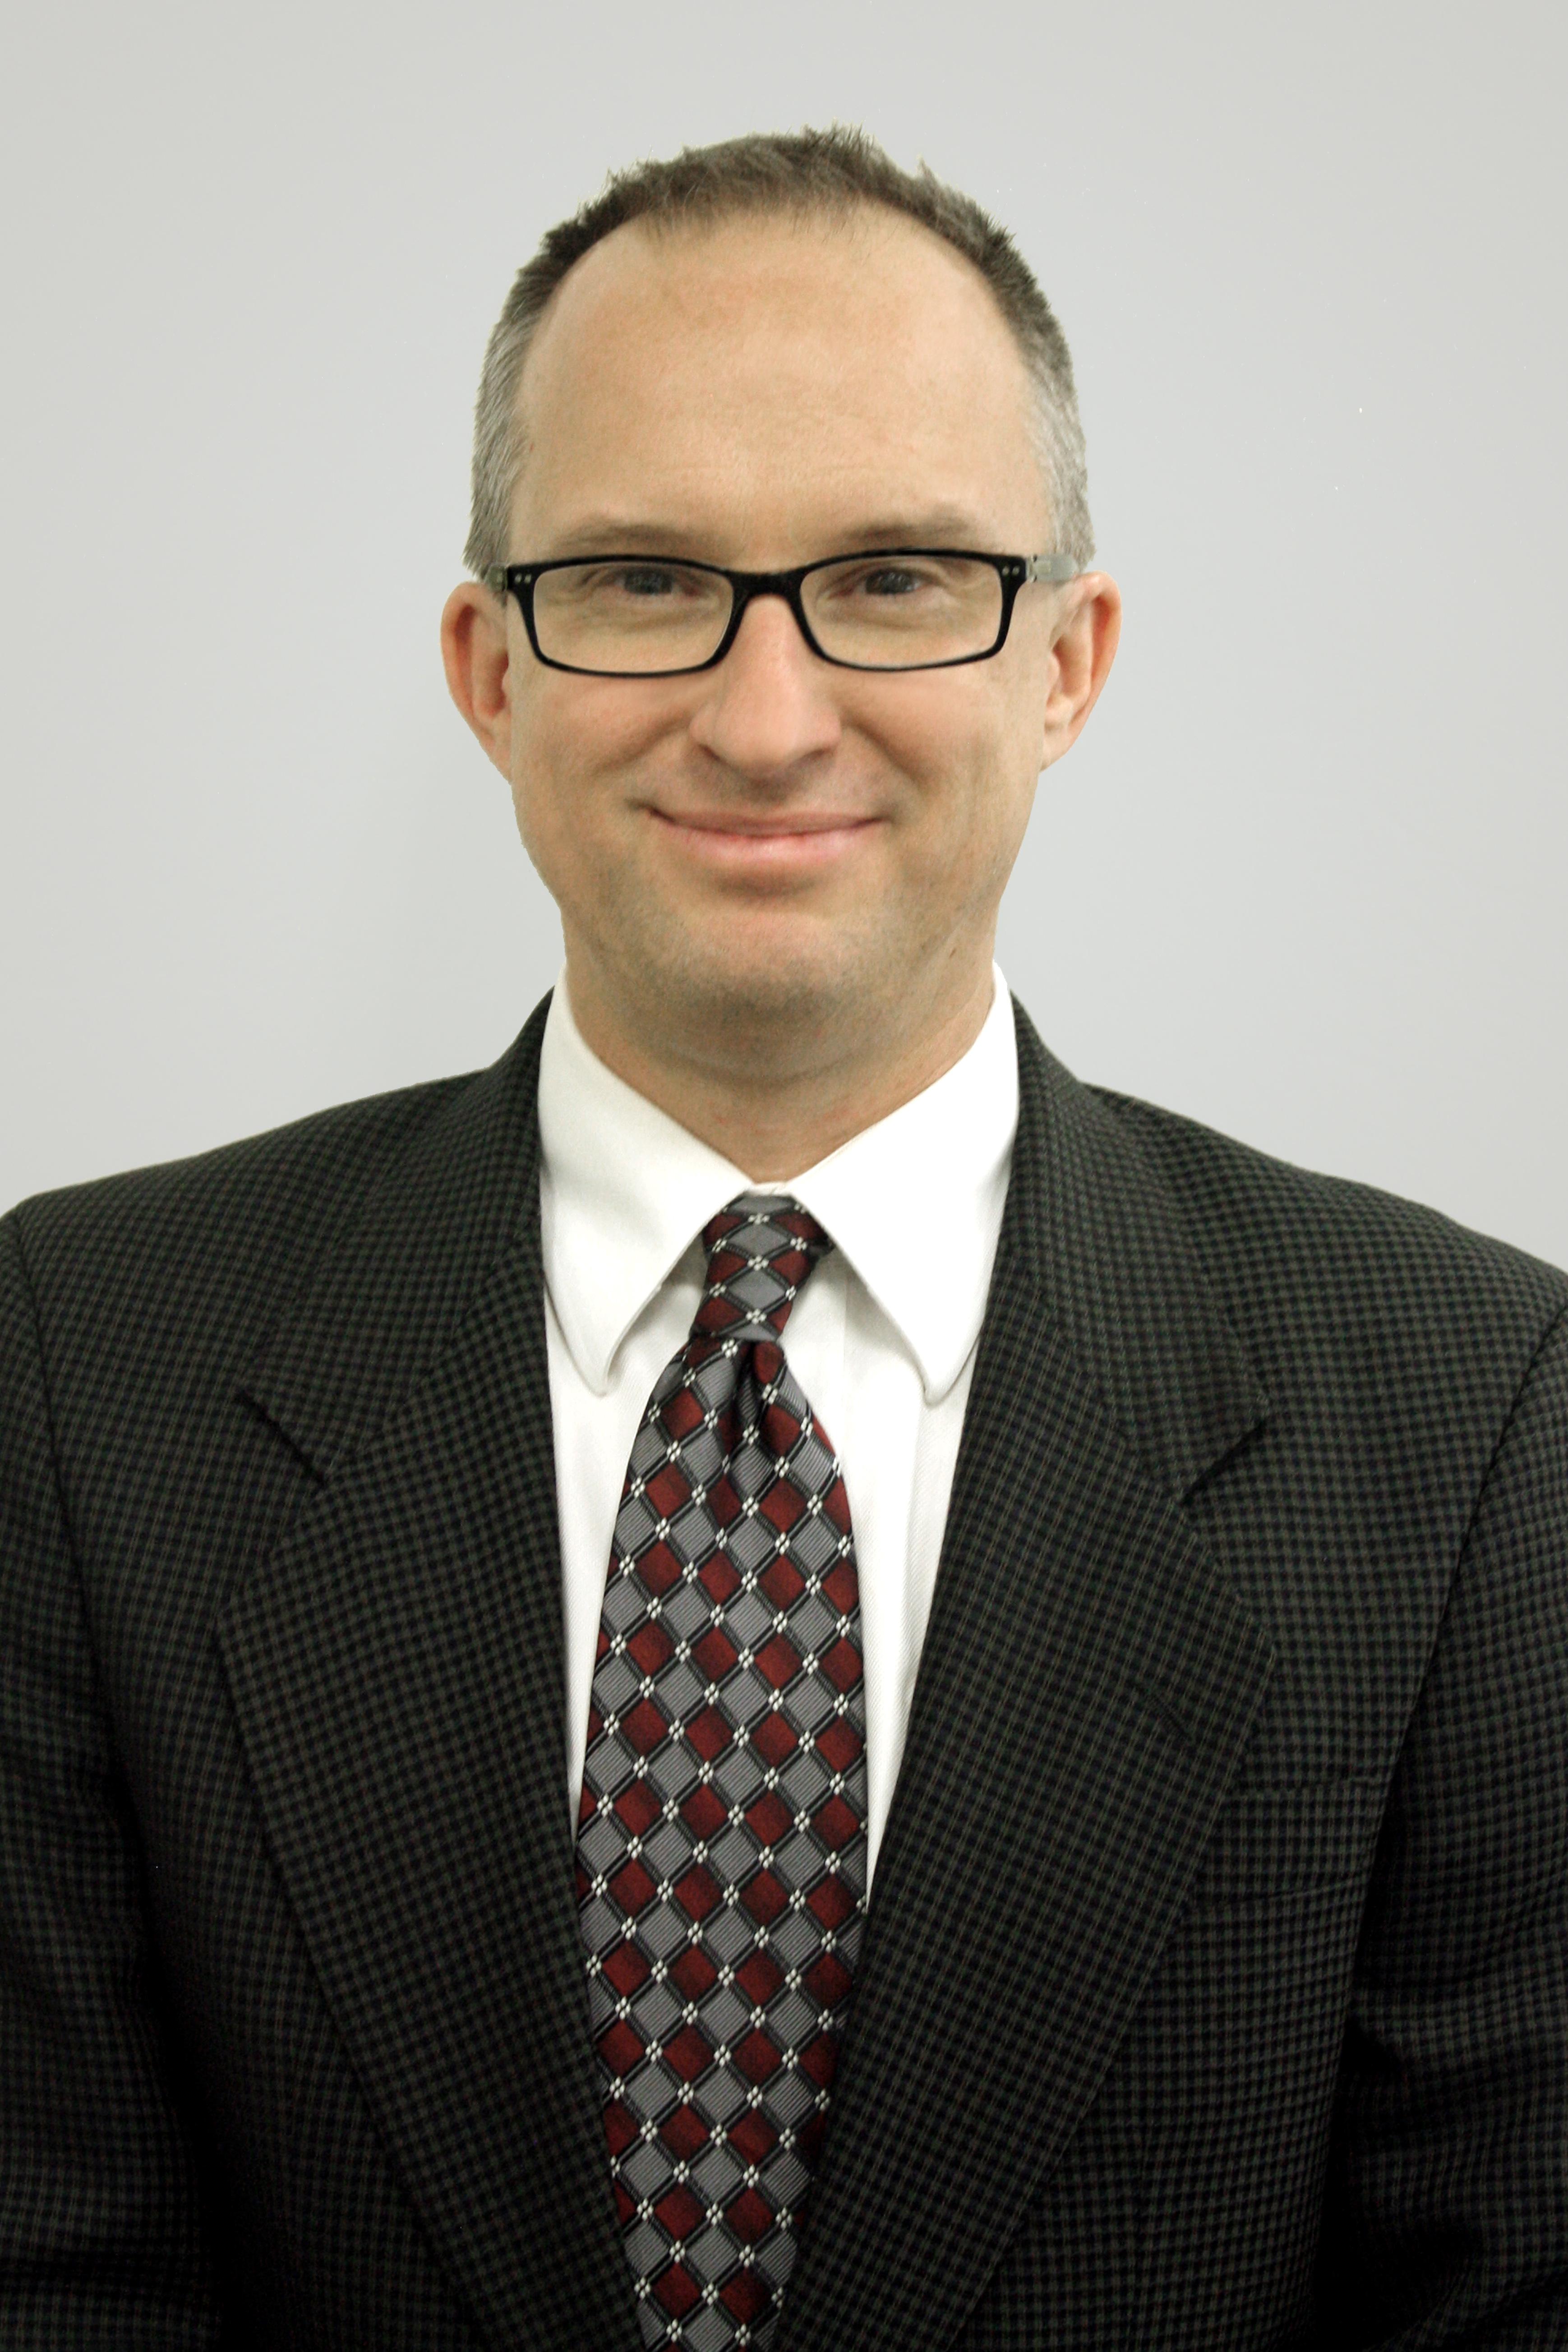 Greg Maksinchuk